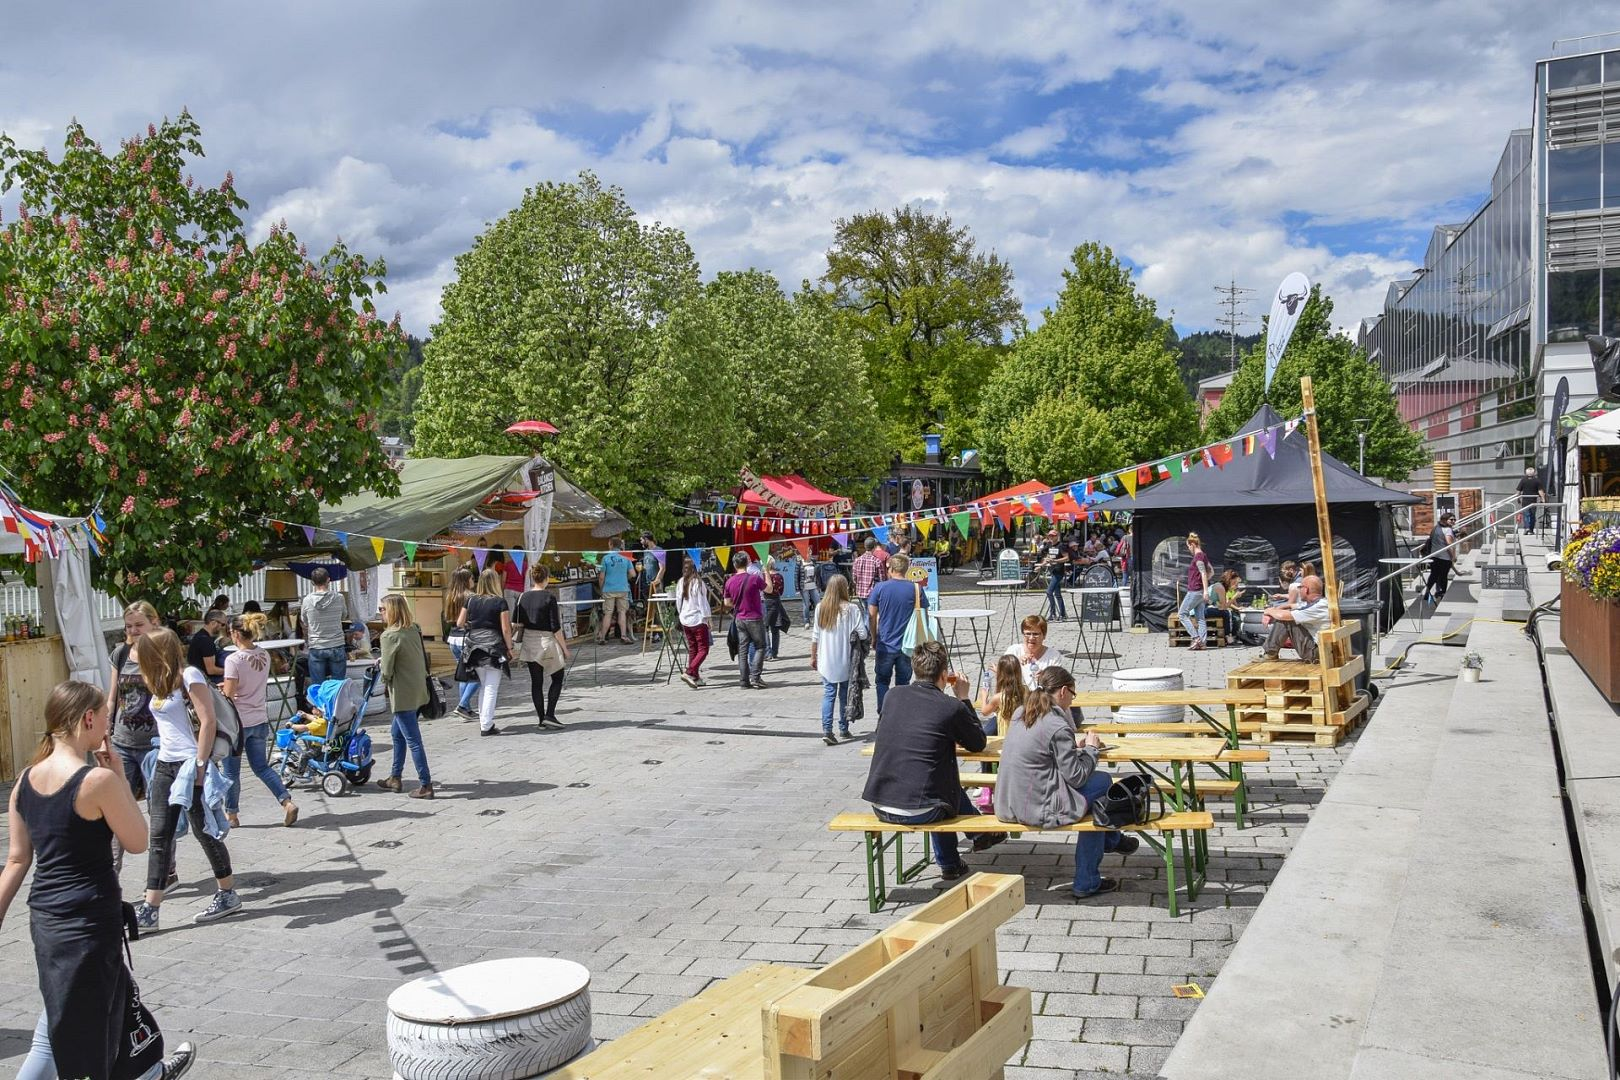 Kulinaria Genussfestival Street Food Markt